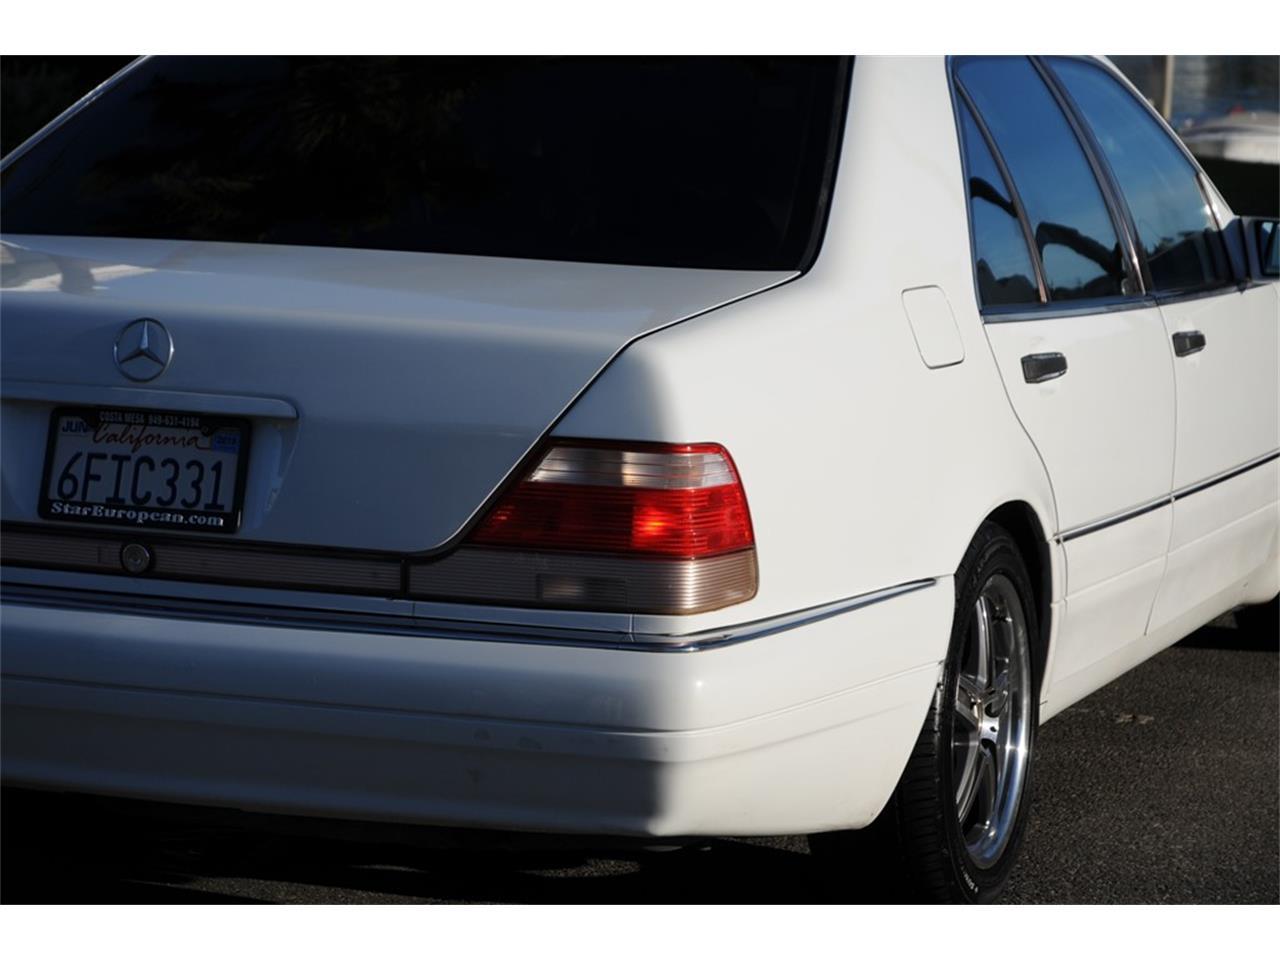 1999 Mercedes-Benz S320 (CC-1159101) for sale in Costa Mesa, California